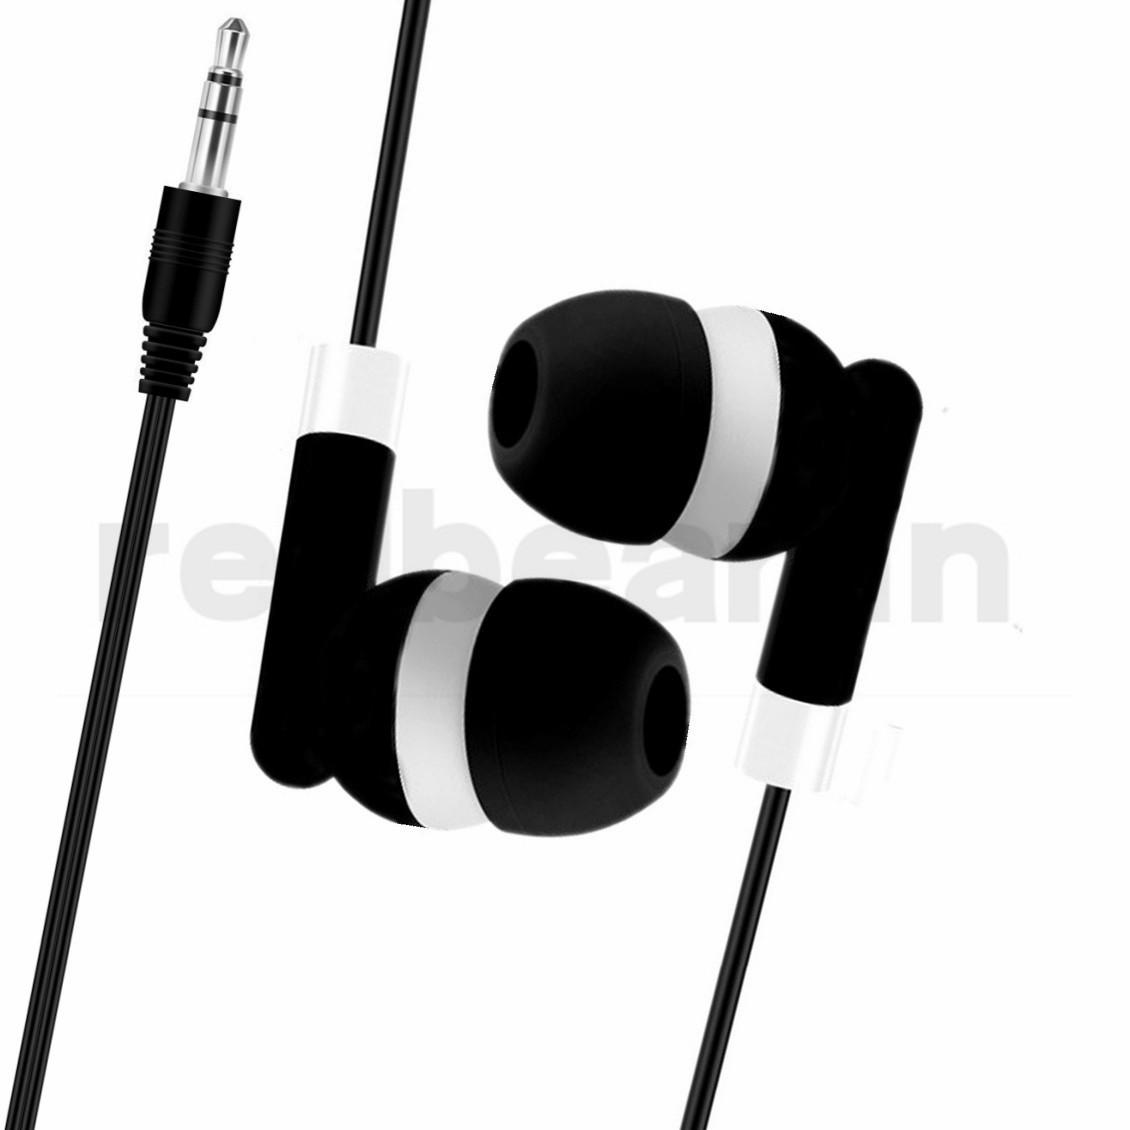 fones de ouvido descartáveis fone ouvido de 3,5 mm jack fones de ouvido fone de ouvido universais para samsung iphone mp3 mp4 tablet android telefone